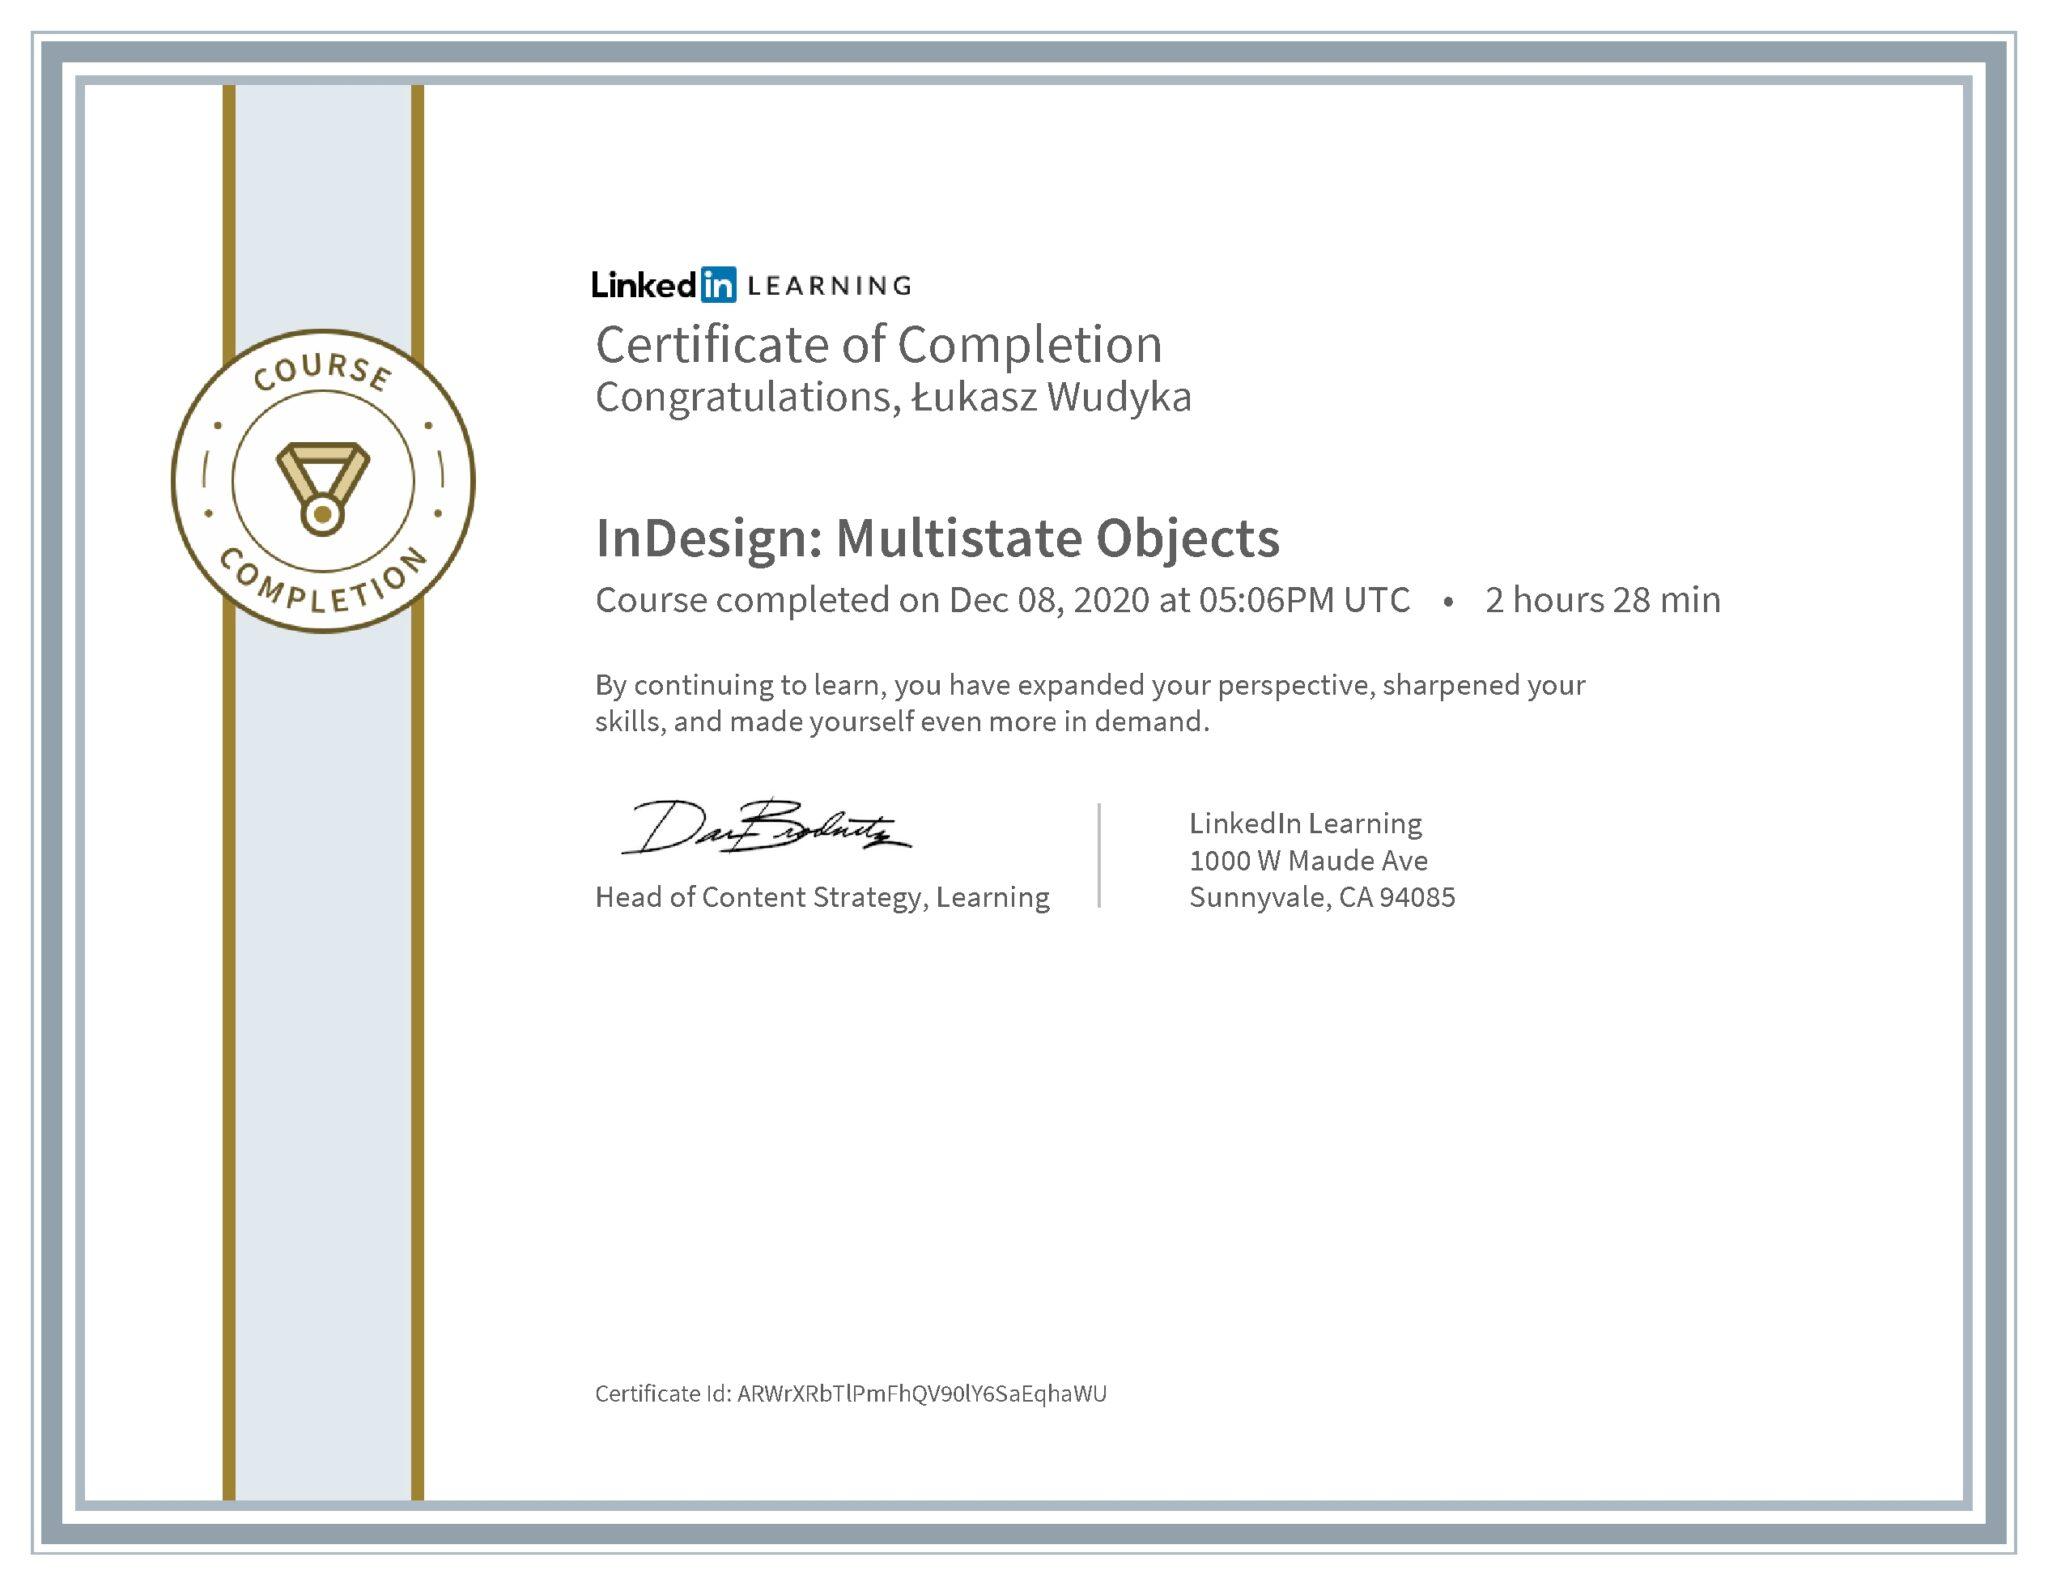 Łukasz Wudyka certyfikat LinkedIn InDesign: Multistate Objects